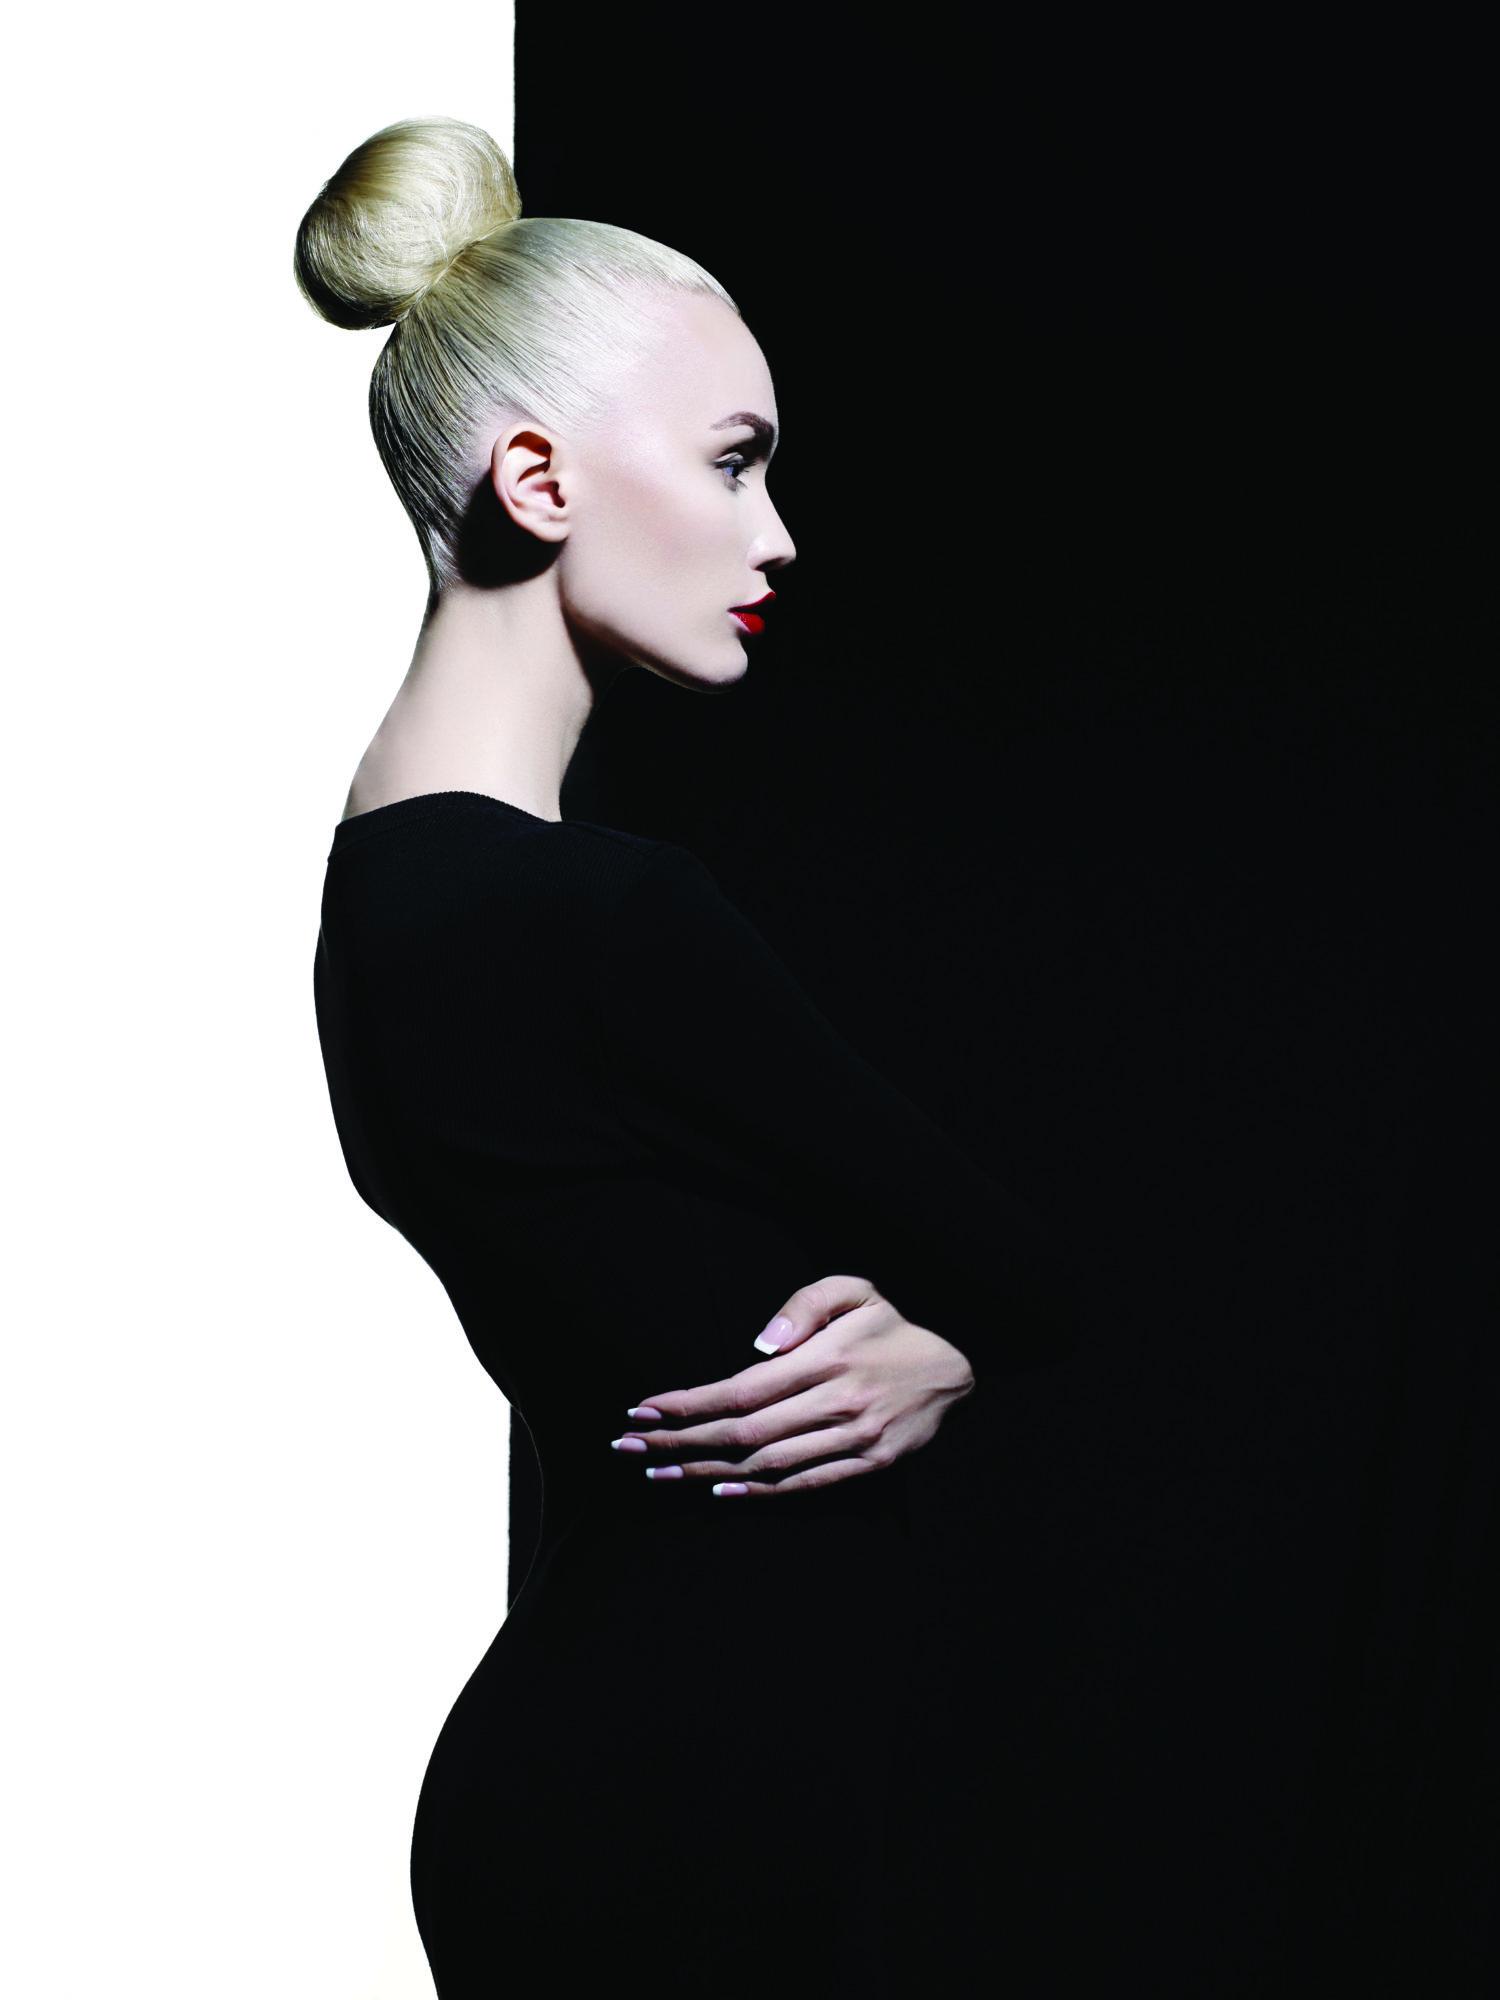 Fast Fashion: The Dark Side Of Retail